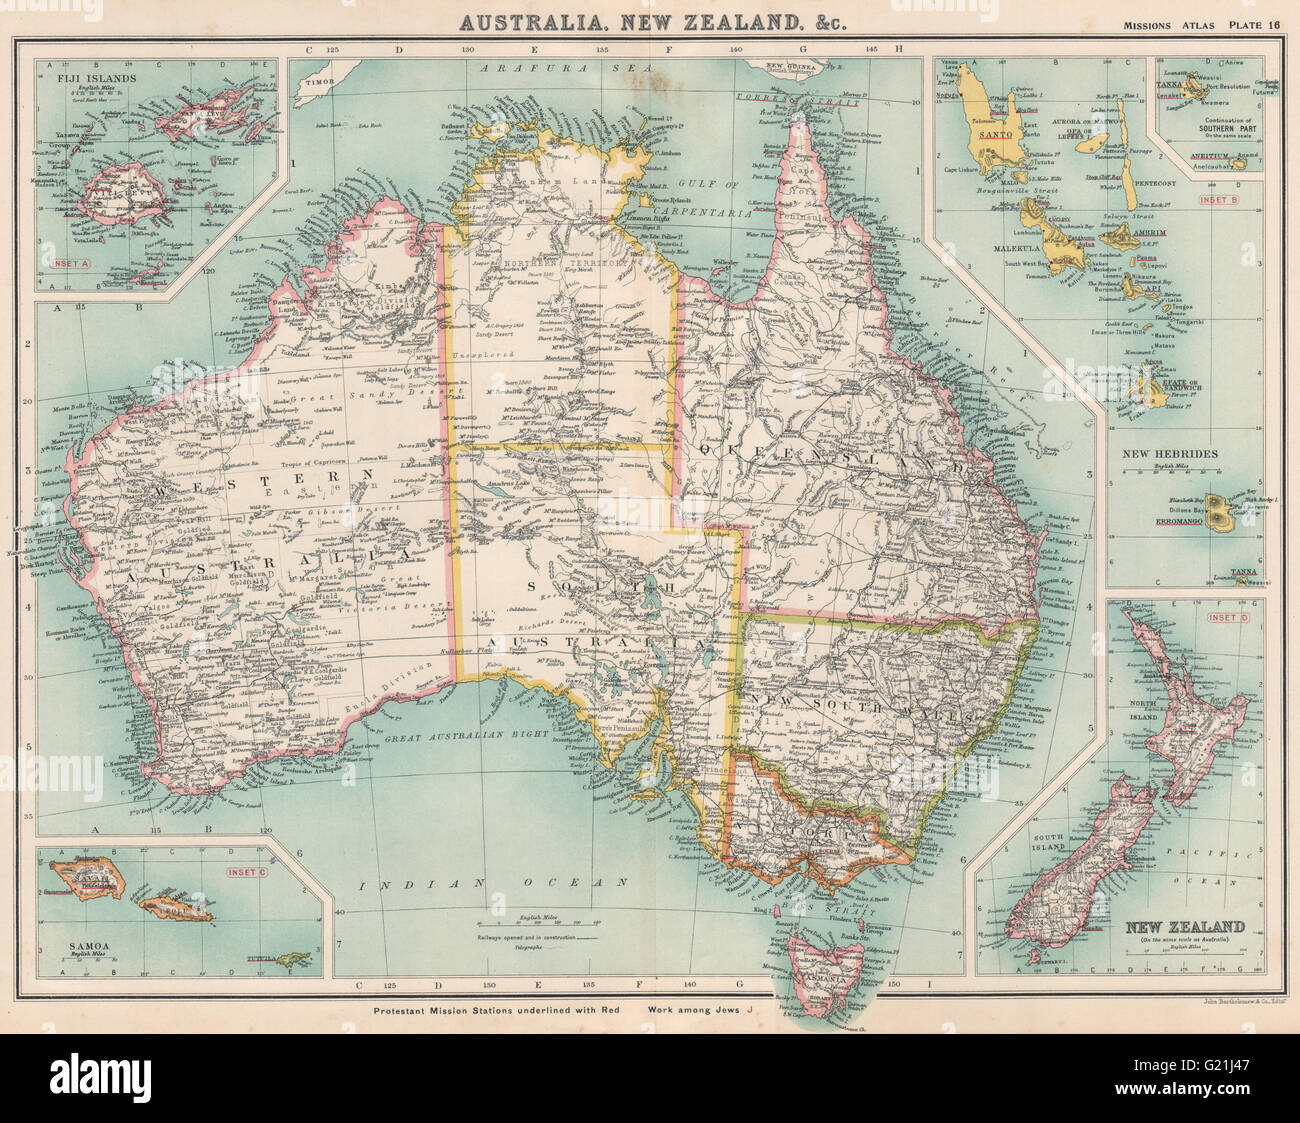 Australia new zealand fiji new hebrides protestant mission australia new zealand fiji new hebrides protestant mission stations 1911 map gumiabroncs Images